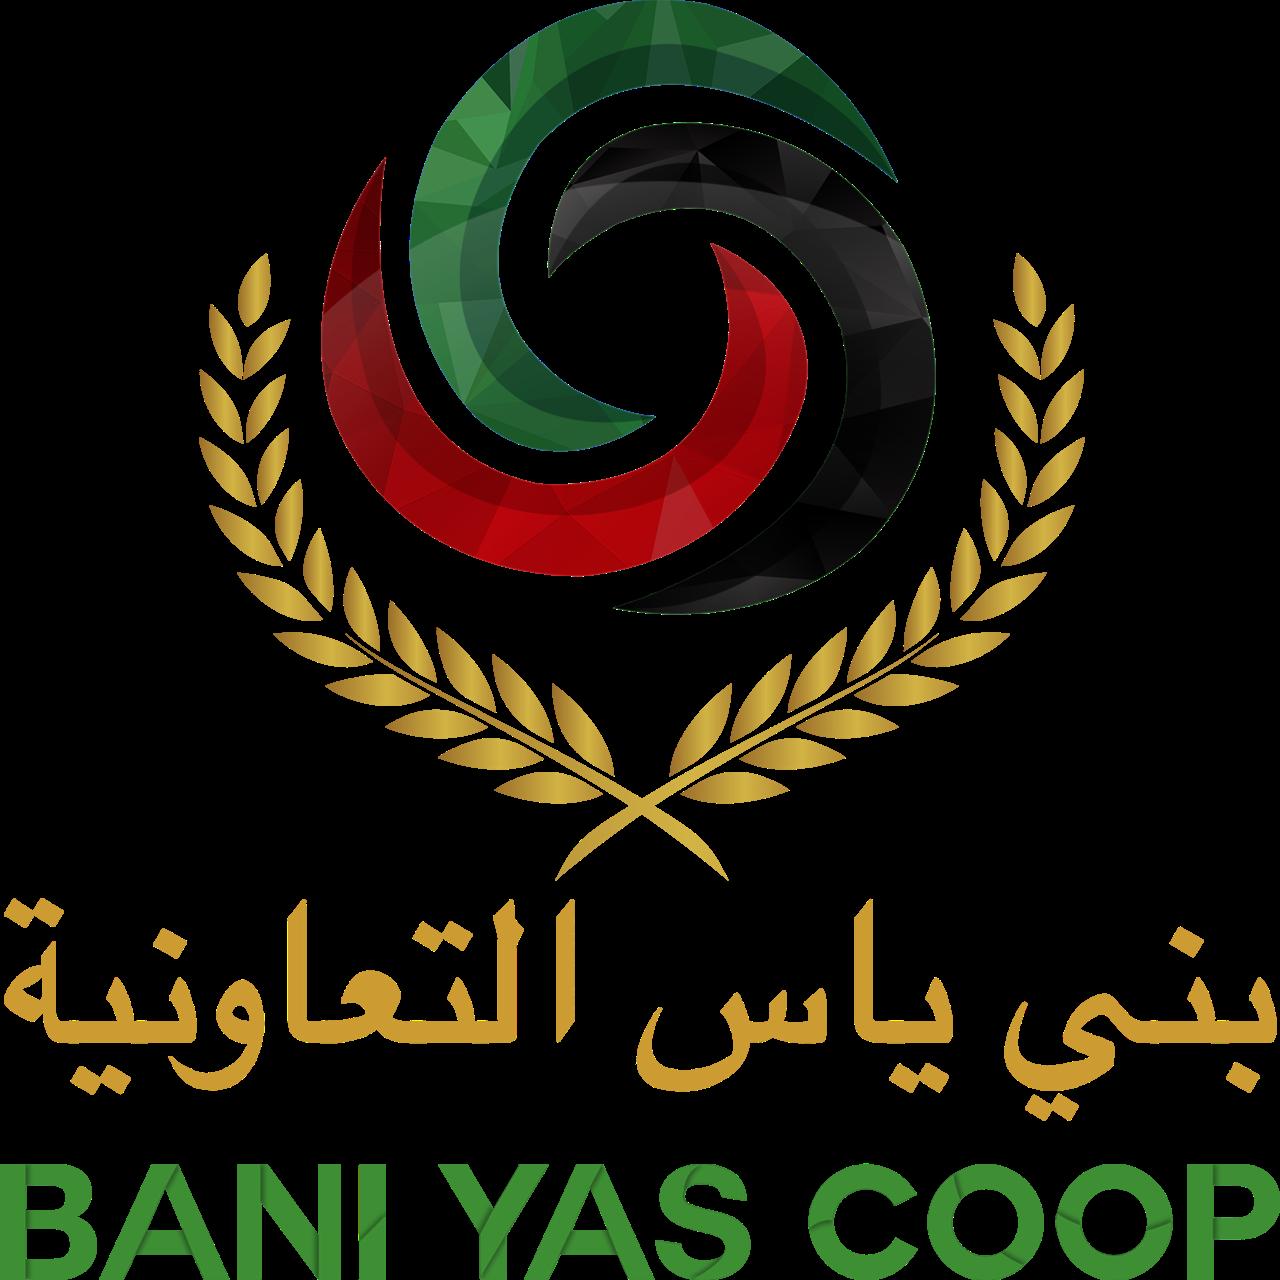 Bani Yas Co-operative Society